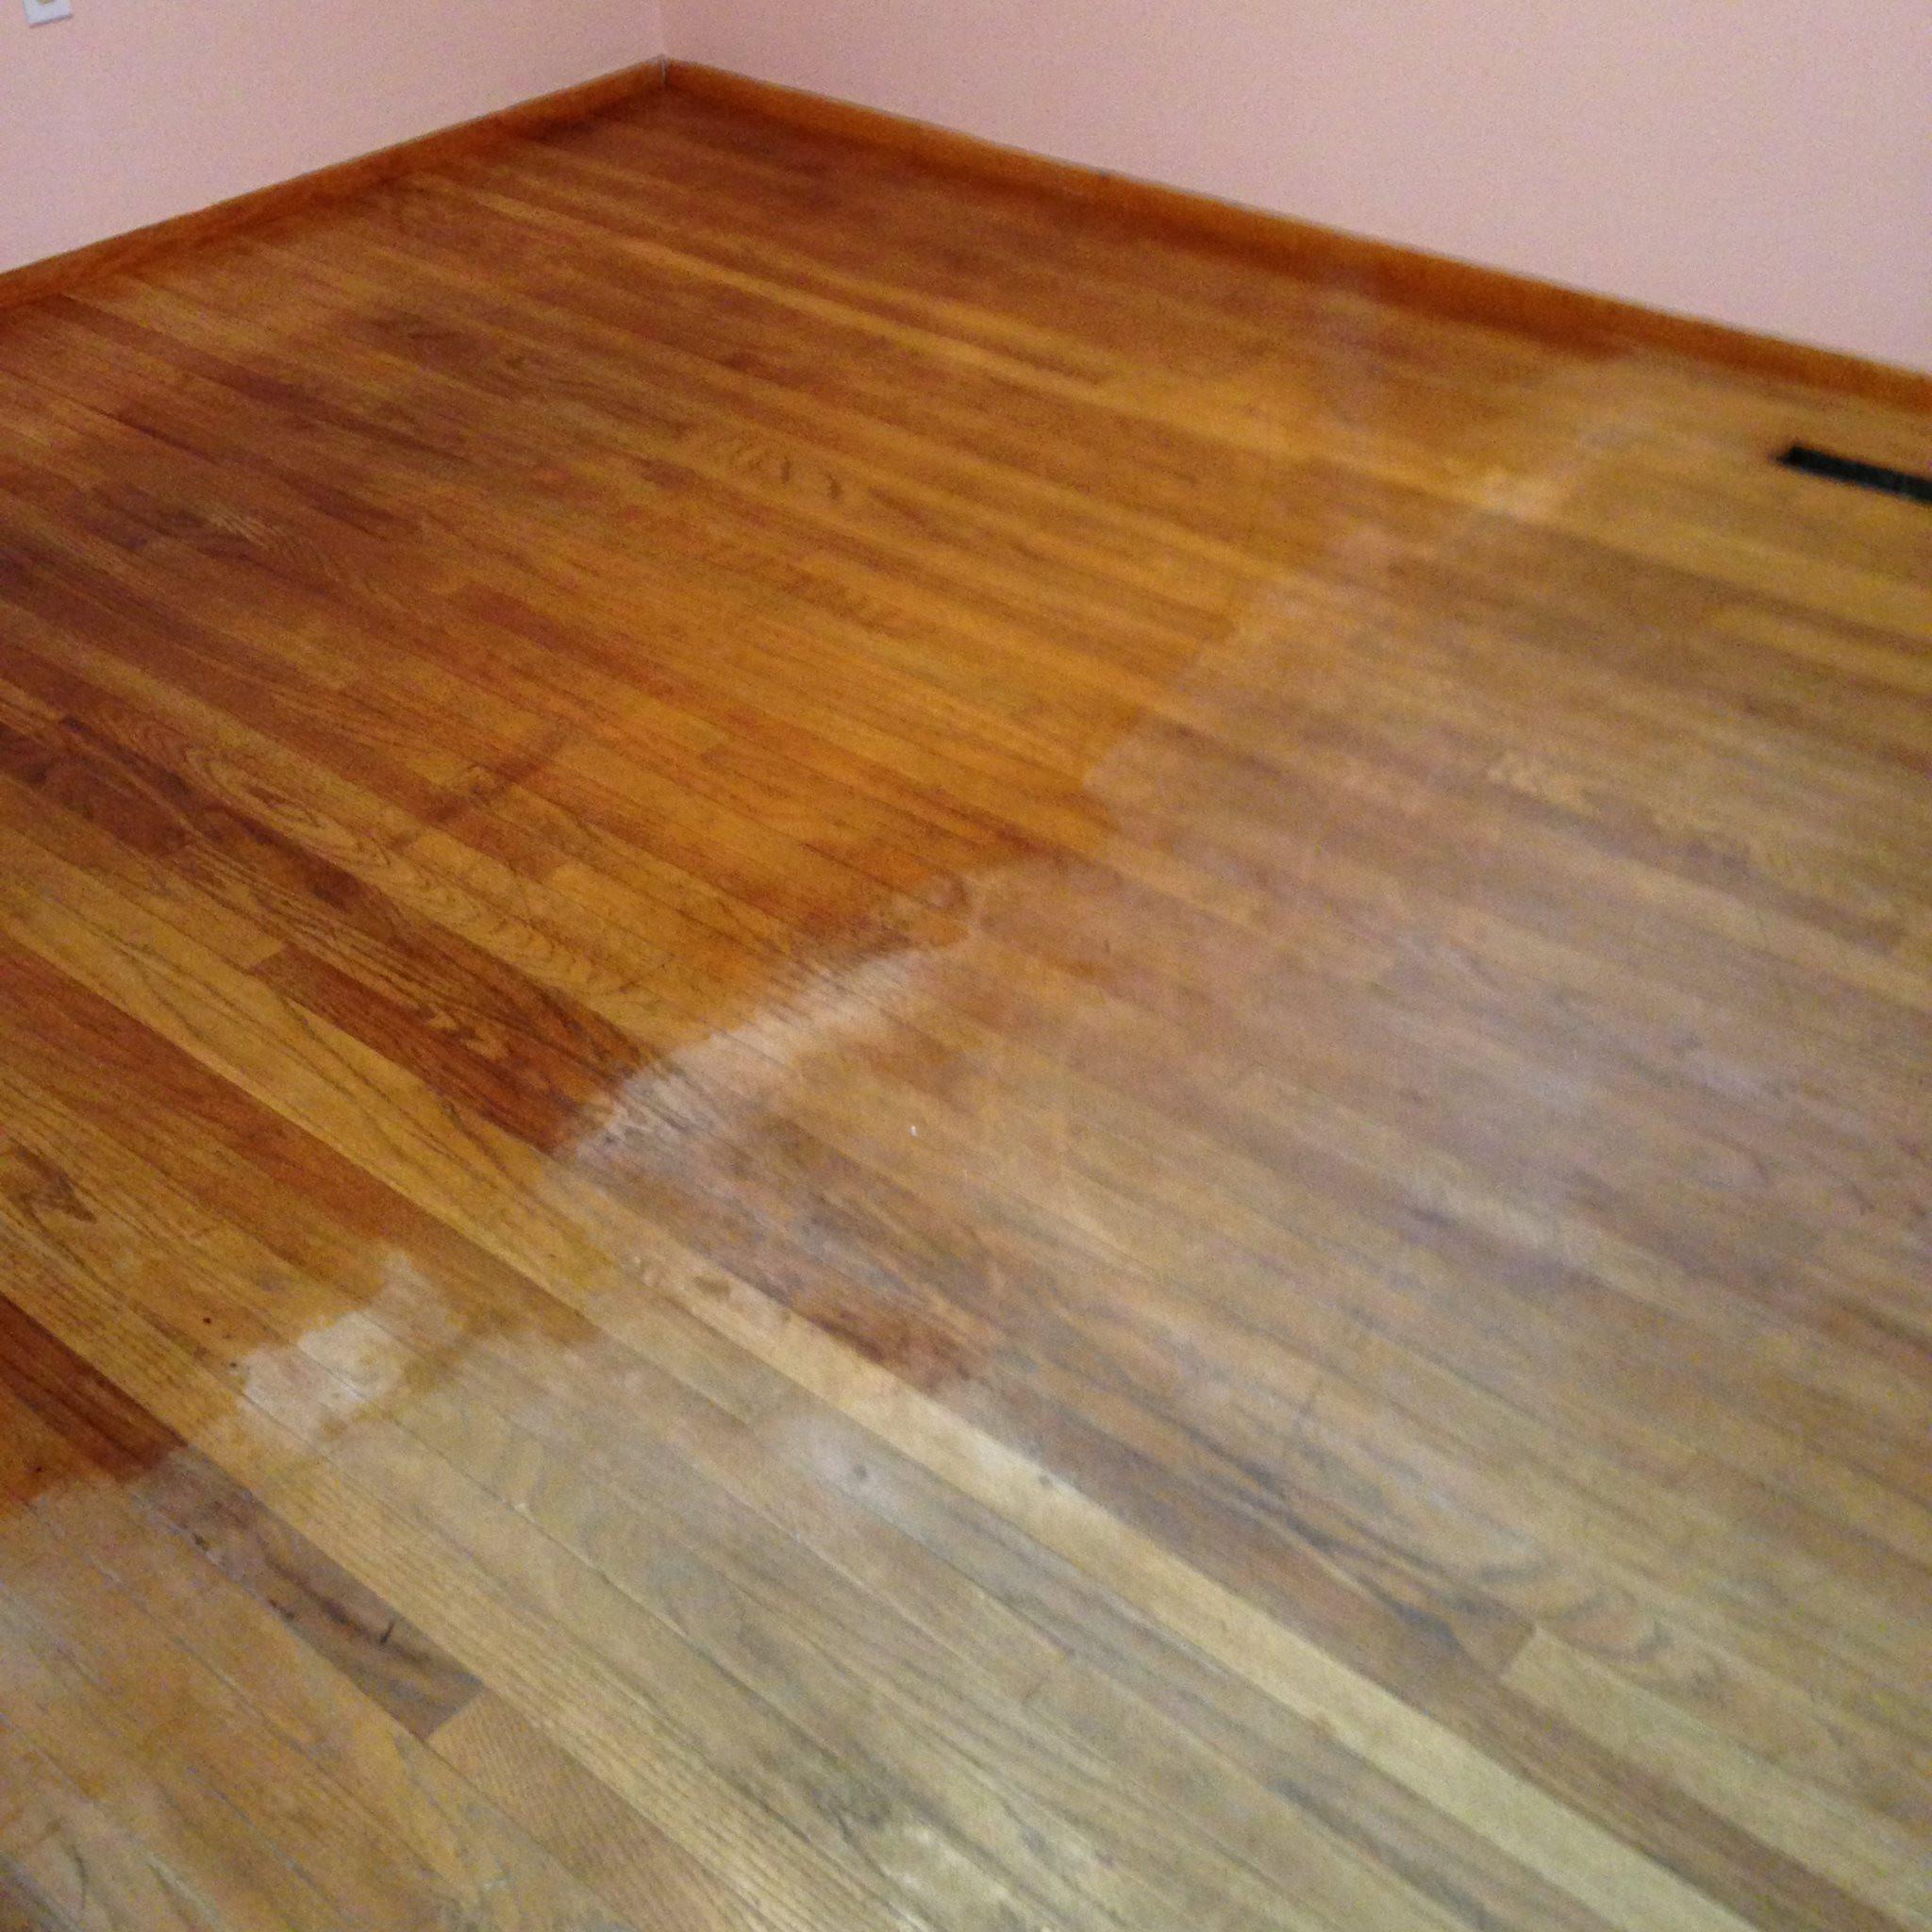 hardwood floor cleaning solution of 15 wood floor hacks every homeowner needs to know regarding wood floor hacks 15